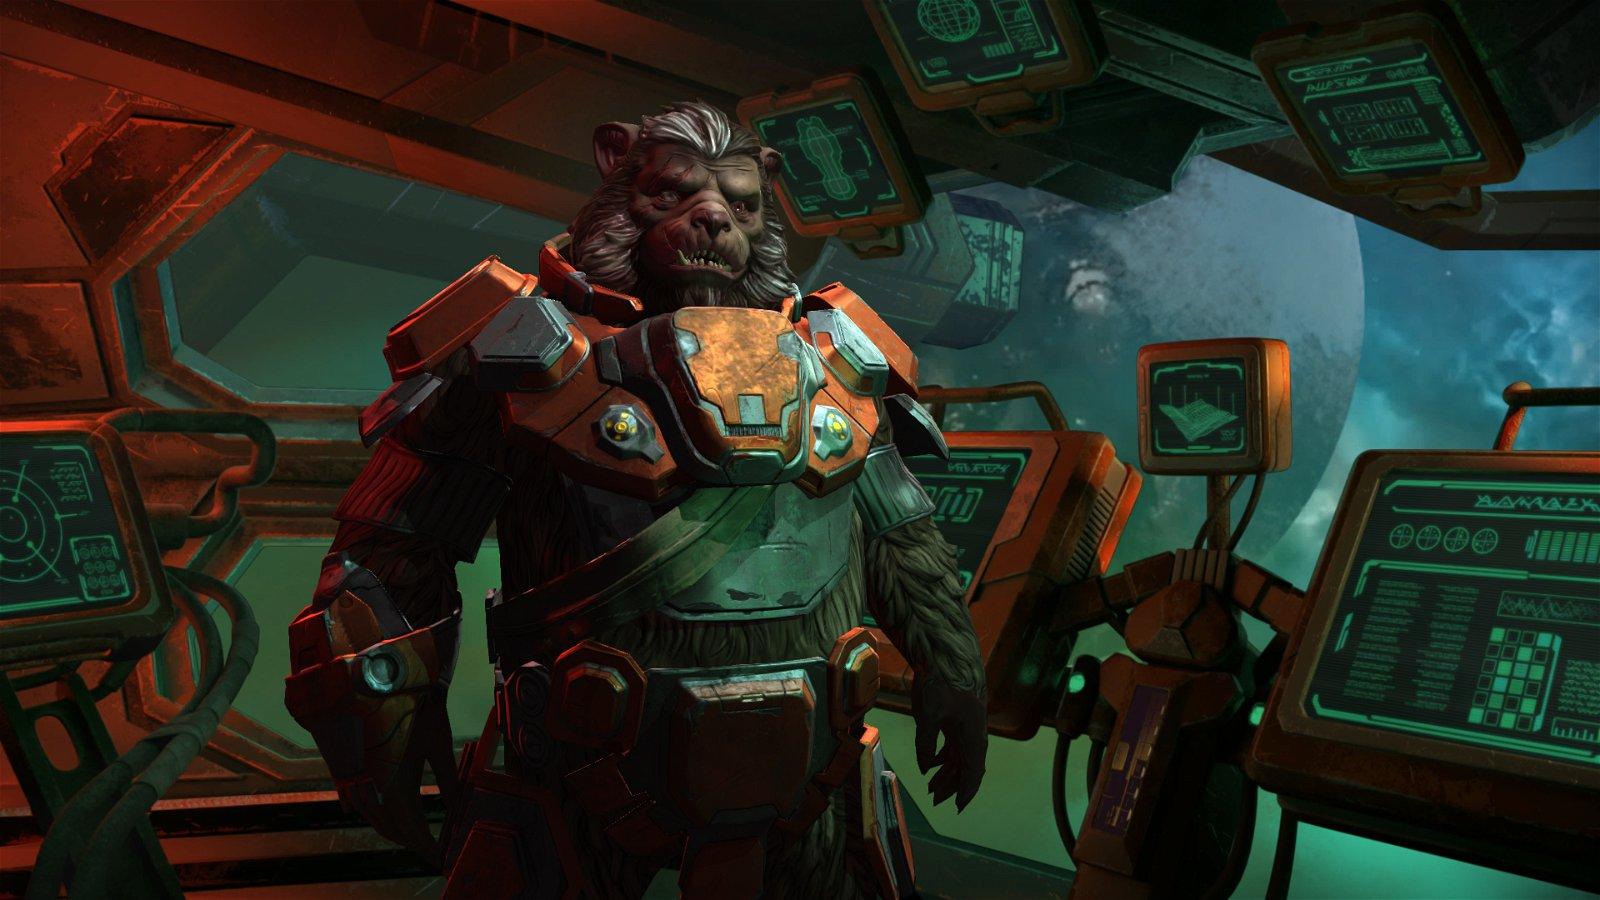 Wargaming Reviving Master Of Orion - 2015-06-09 09:39:47